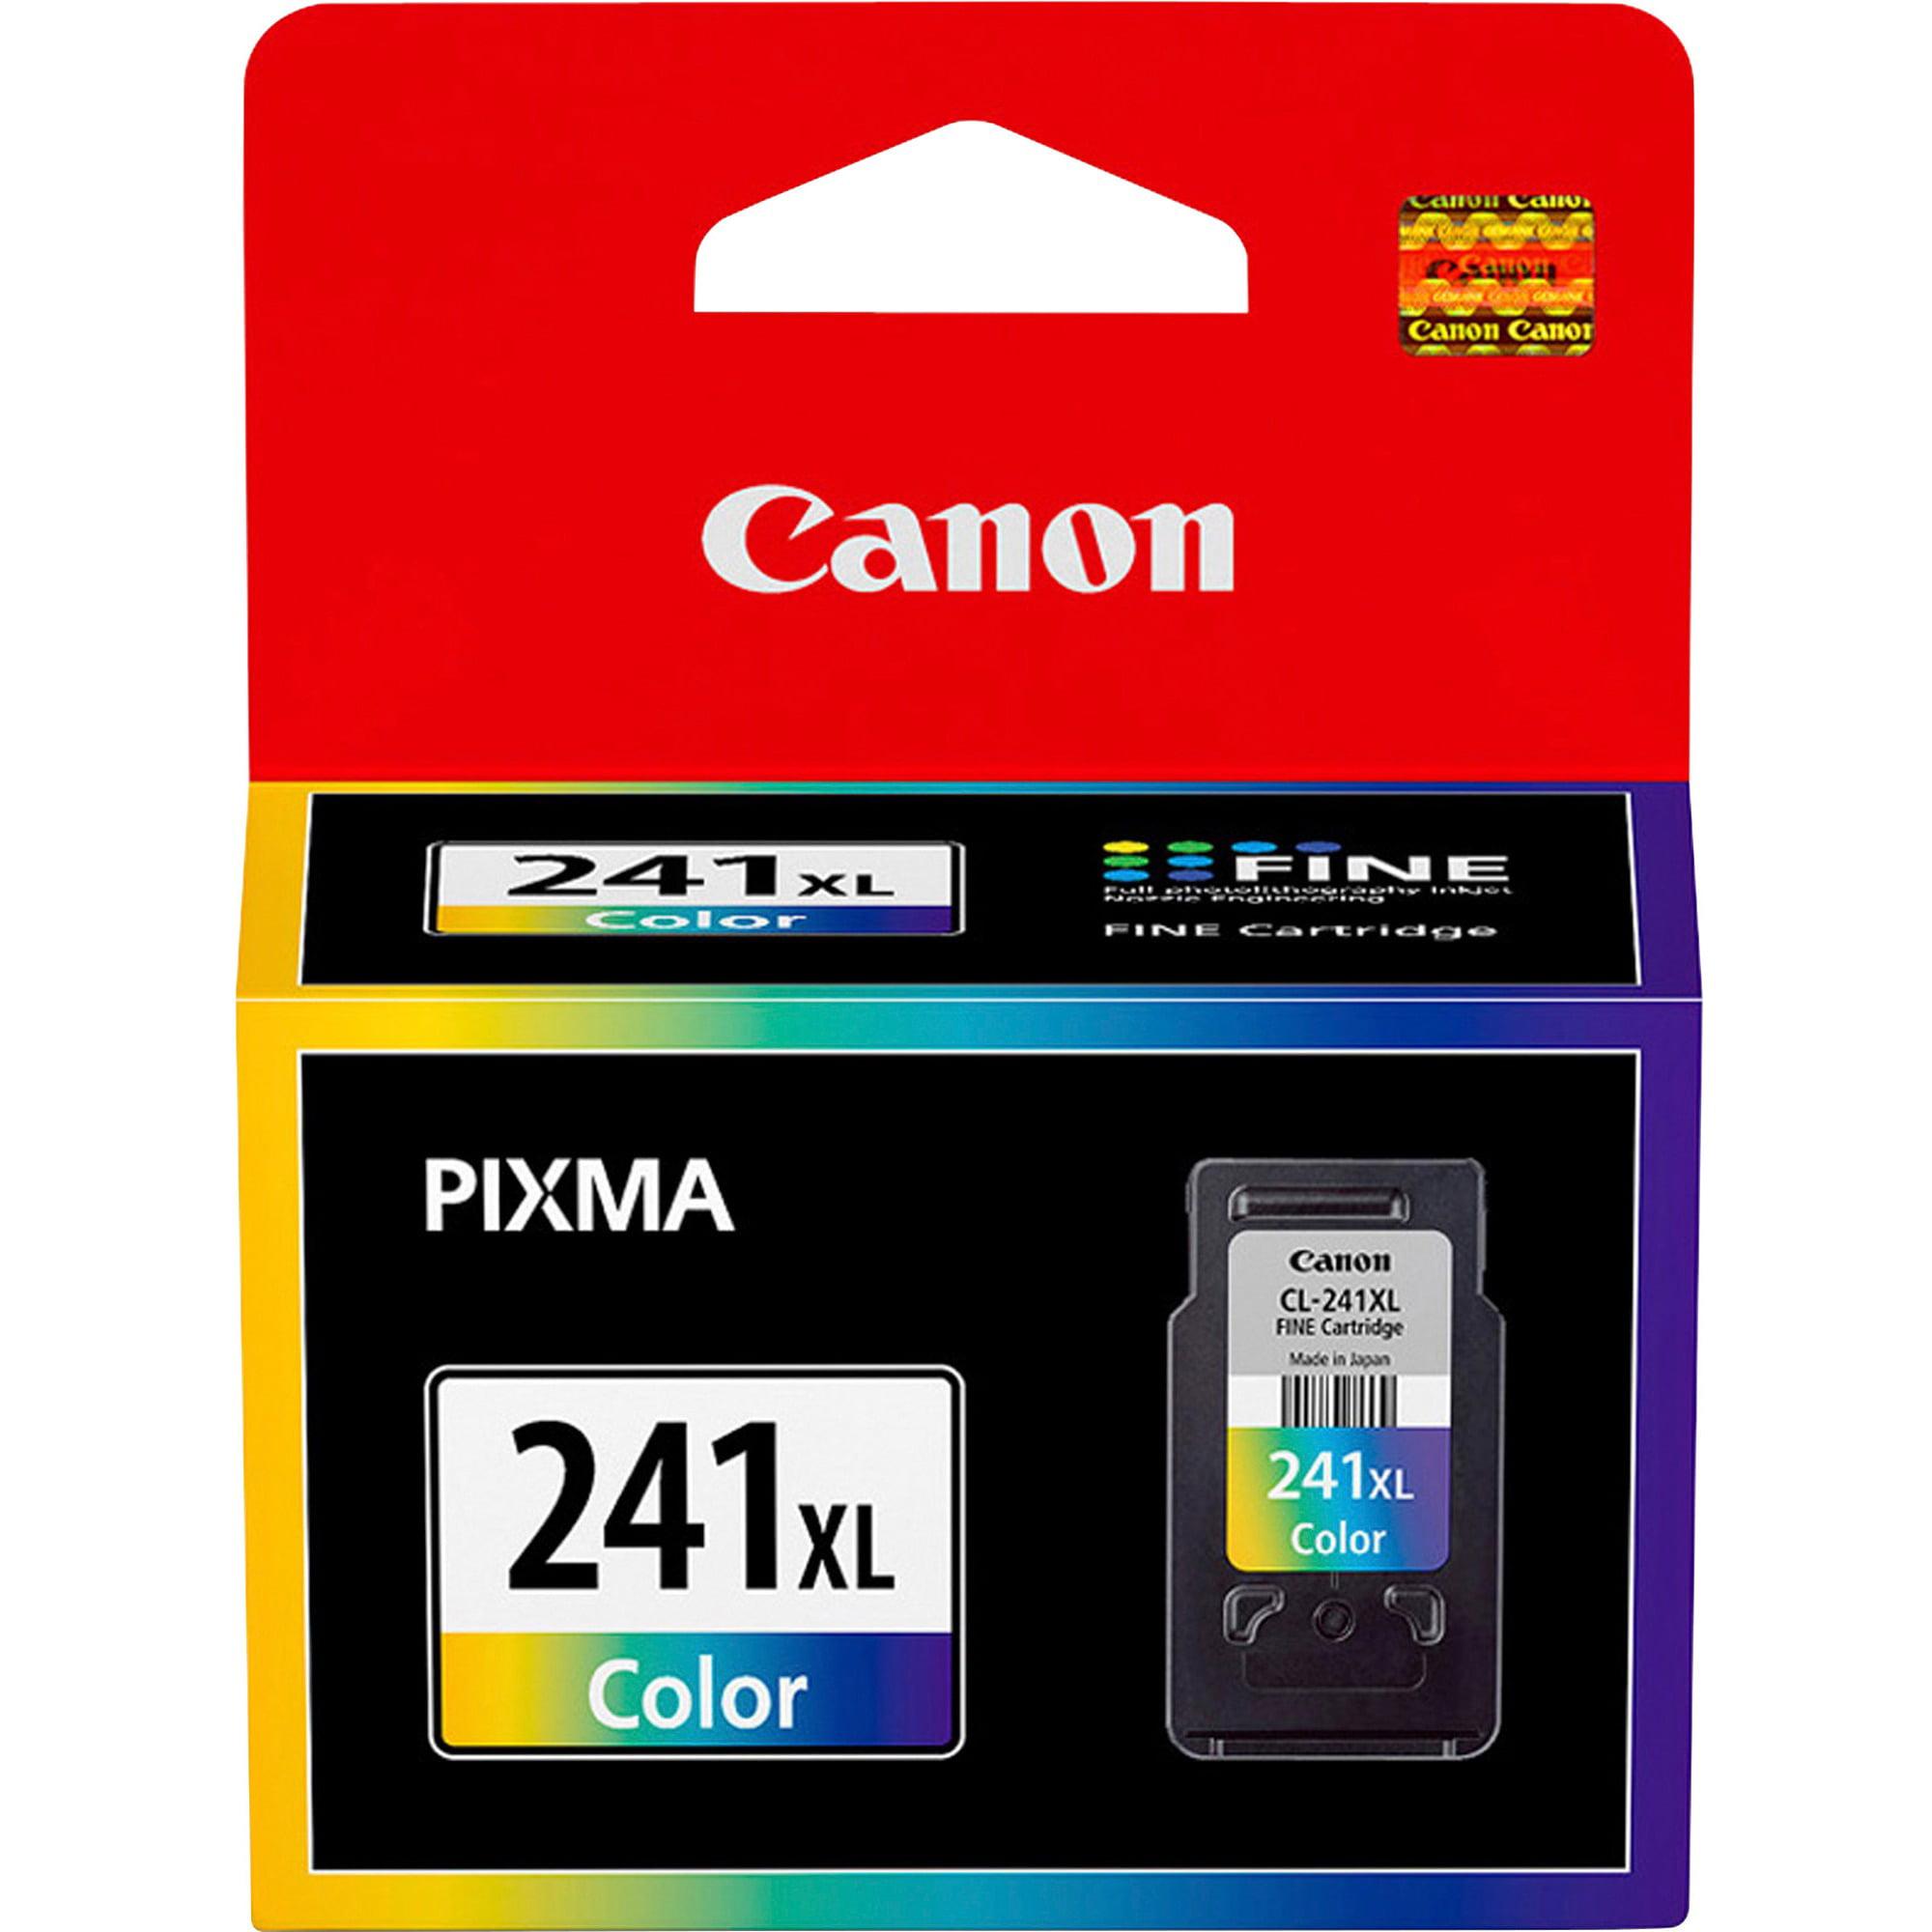 Canon CL241XL Original Ink Cartridge, 1 Each (Quantity)